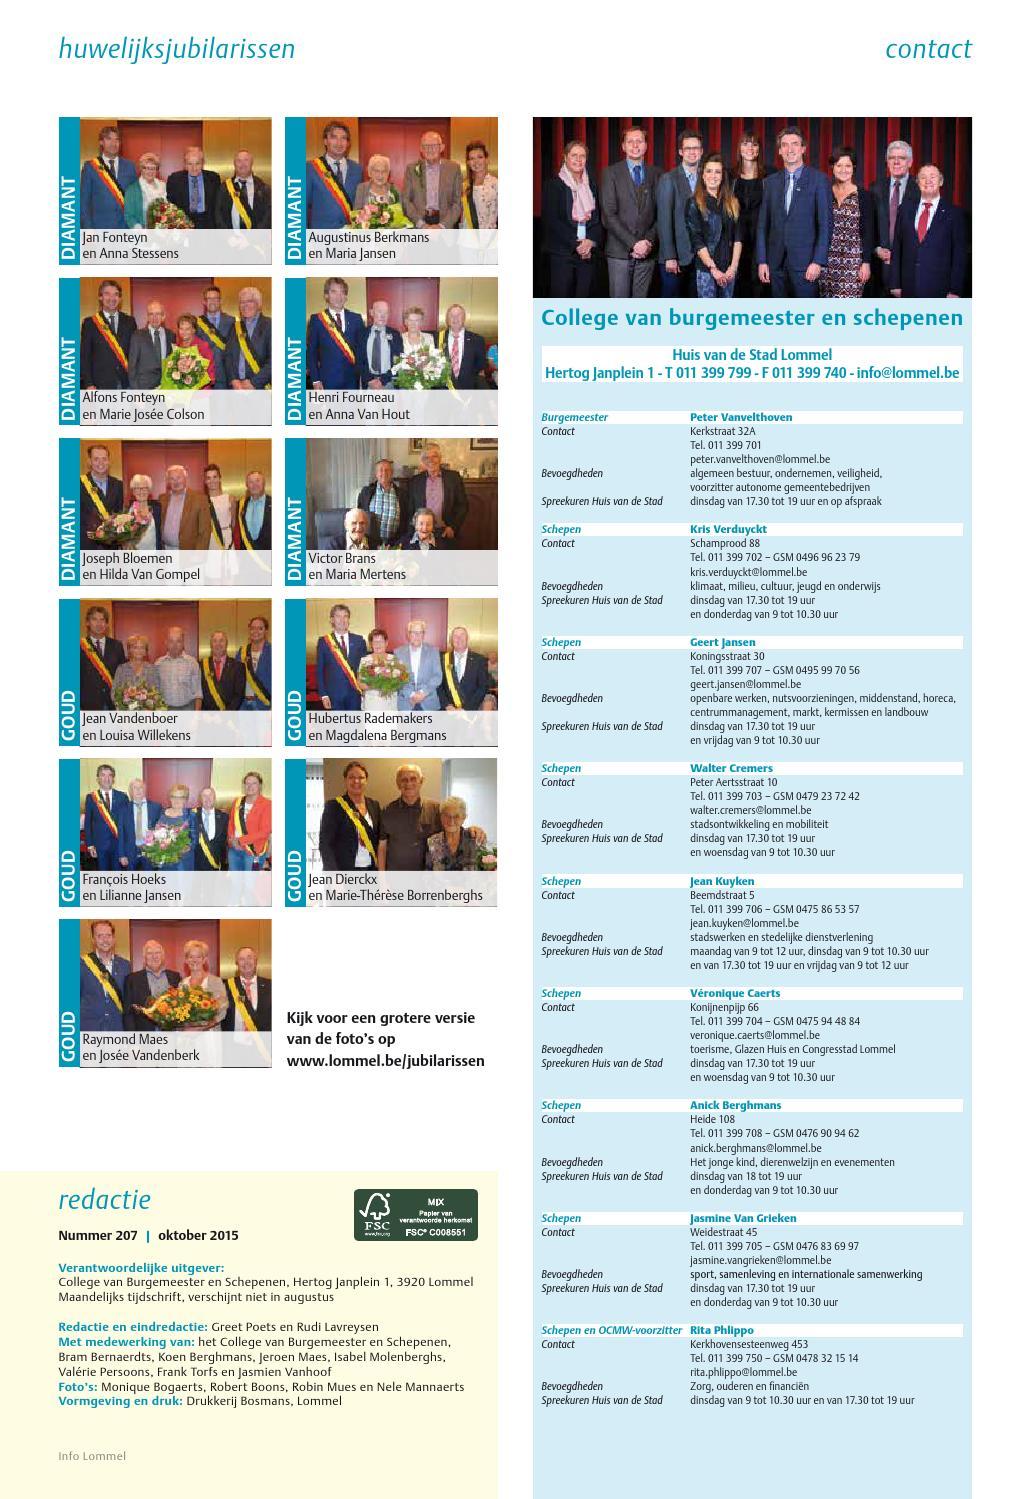 Anick Berghmans info lommel oktober 2015stad lommel - issuu